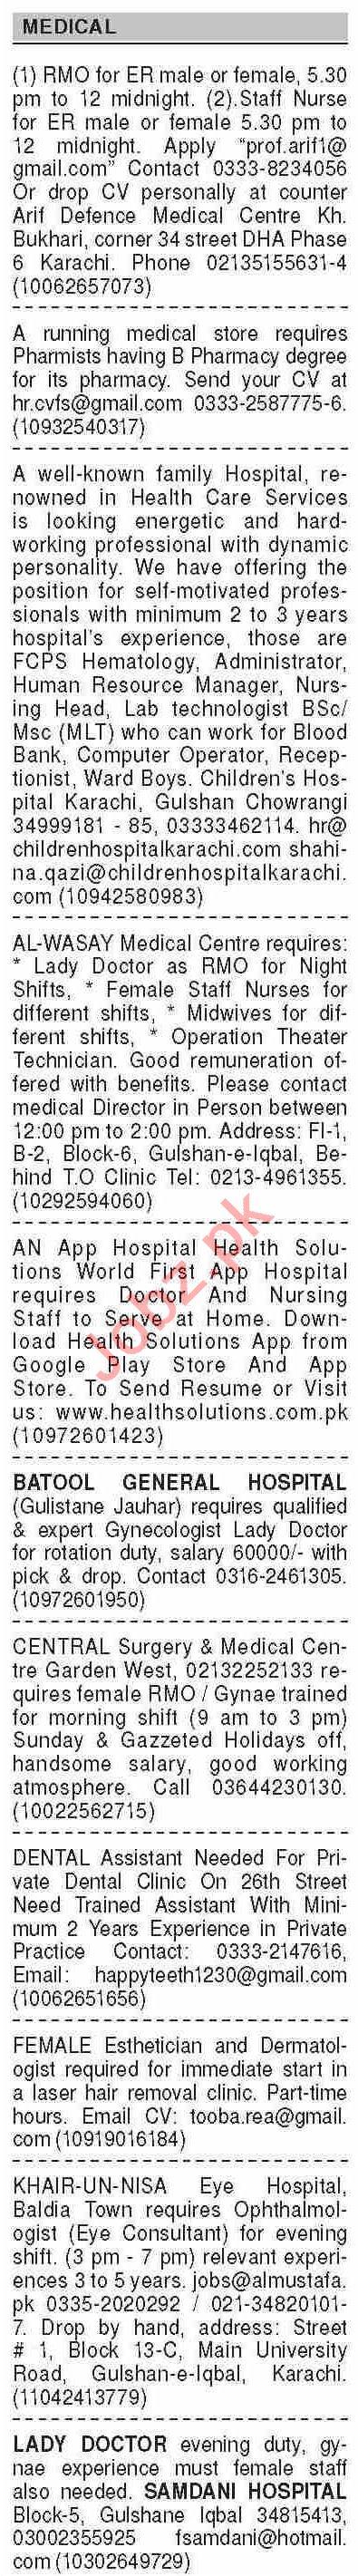 Dawn Sunday Classified Ads 8th Nov 2020 for Medical Staff